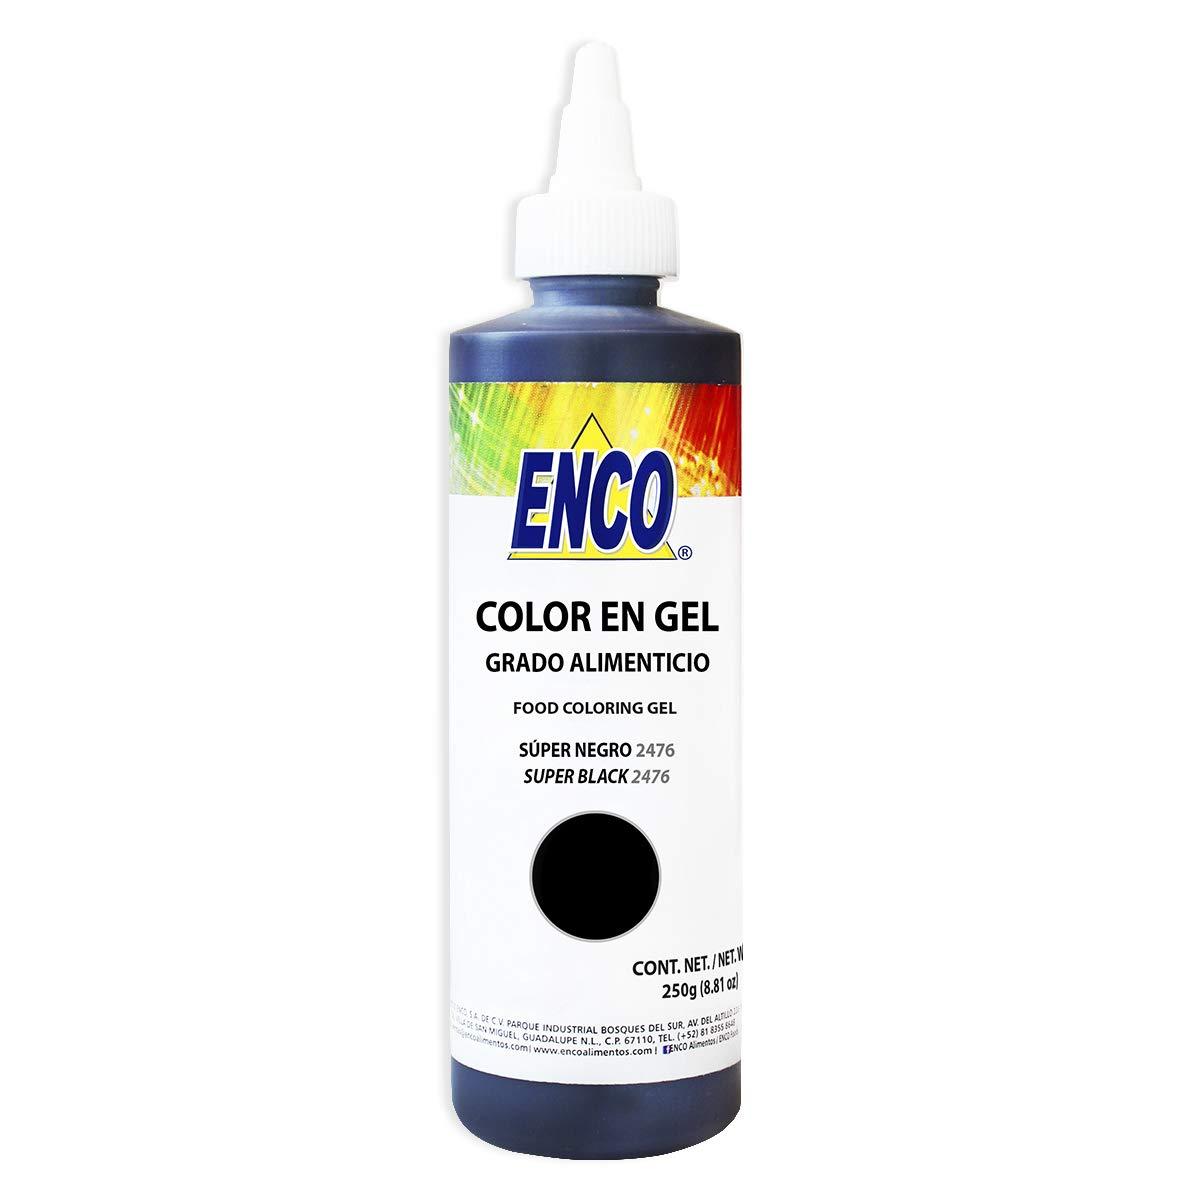 ENCO GEL FOOD COLOR 8.8 OZ (SUPER BLACK 2476)